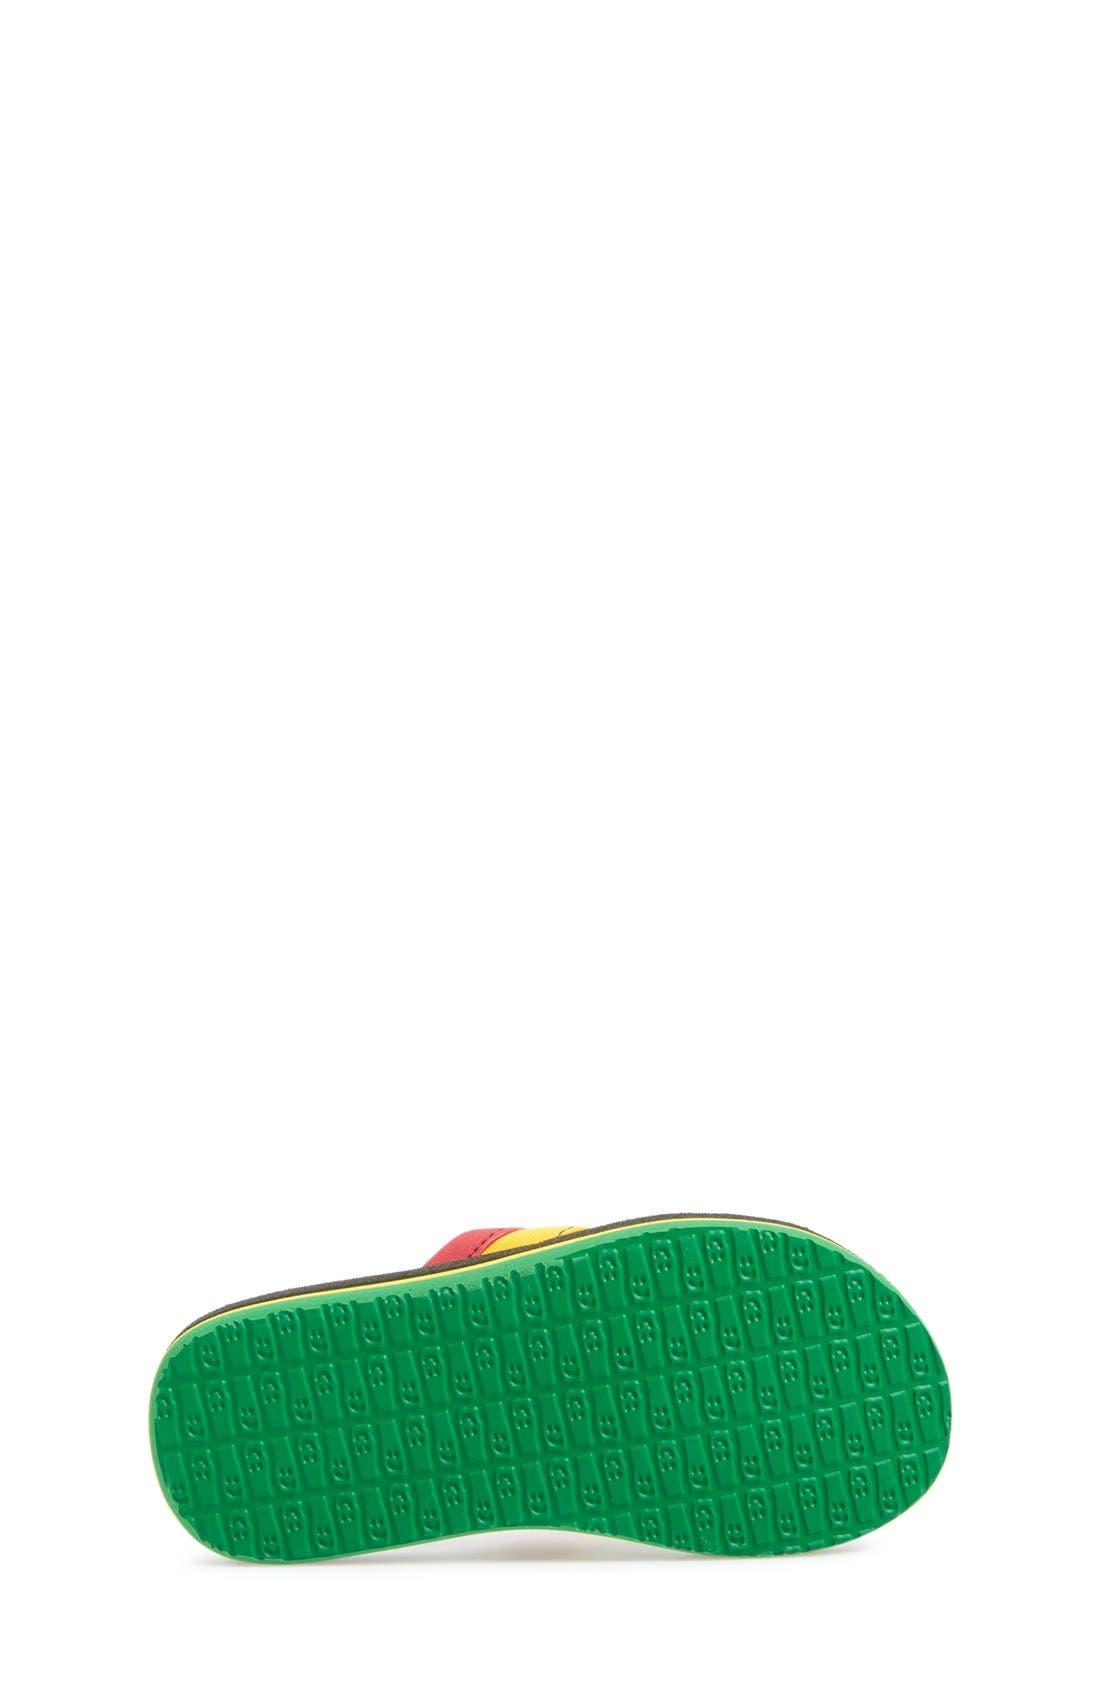 'Rootbeer Cozy' Lightweight Flip Flop Sandal,                             Alternate thumbnail 24, color,